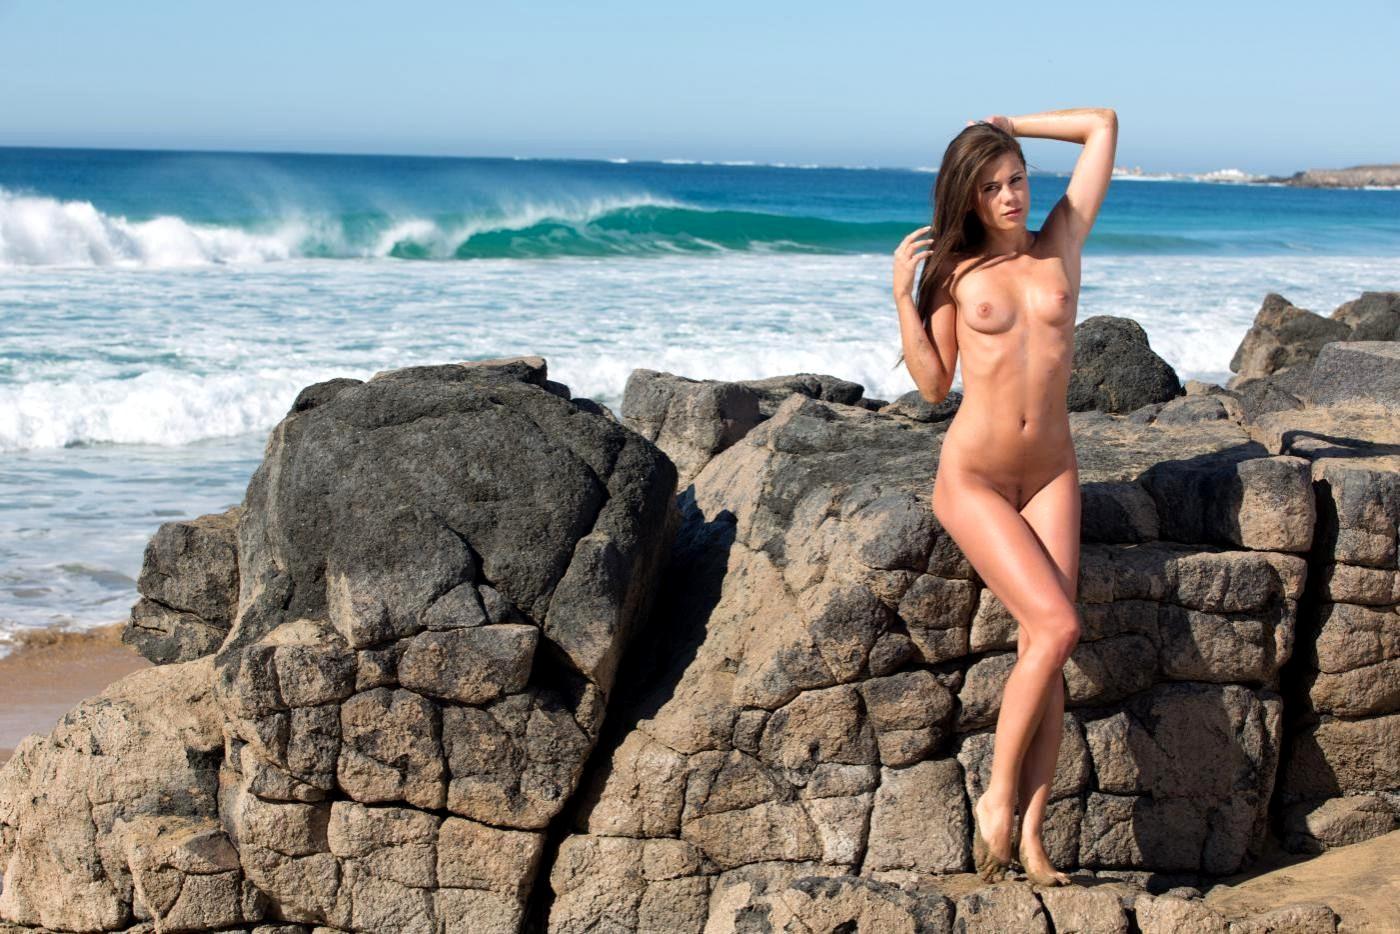 Capri cavanni gets ready nude